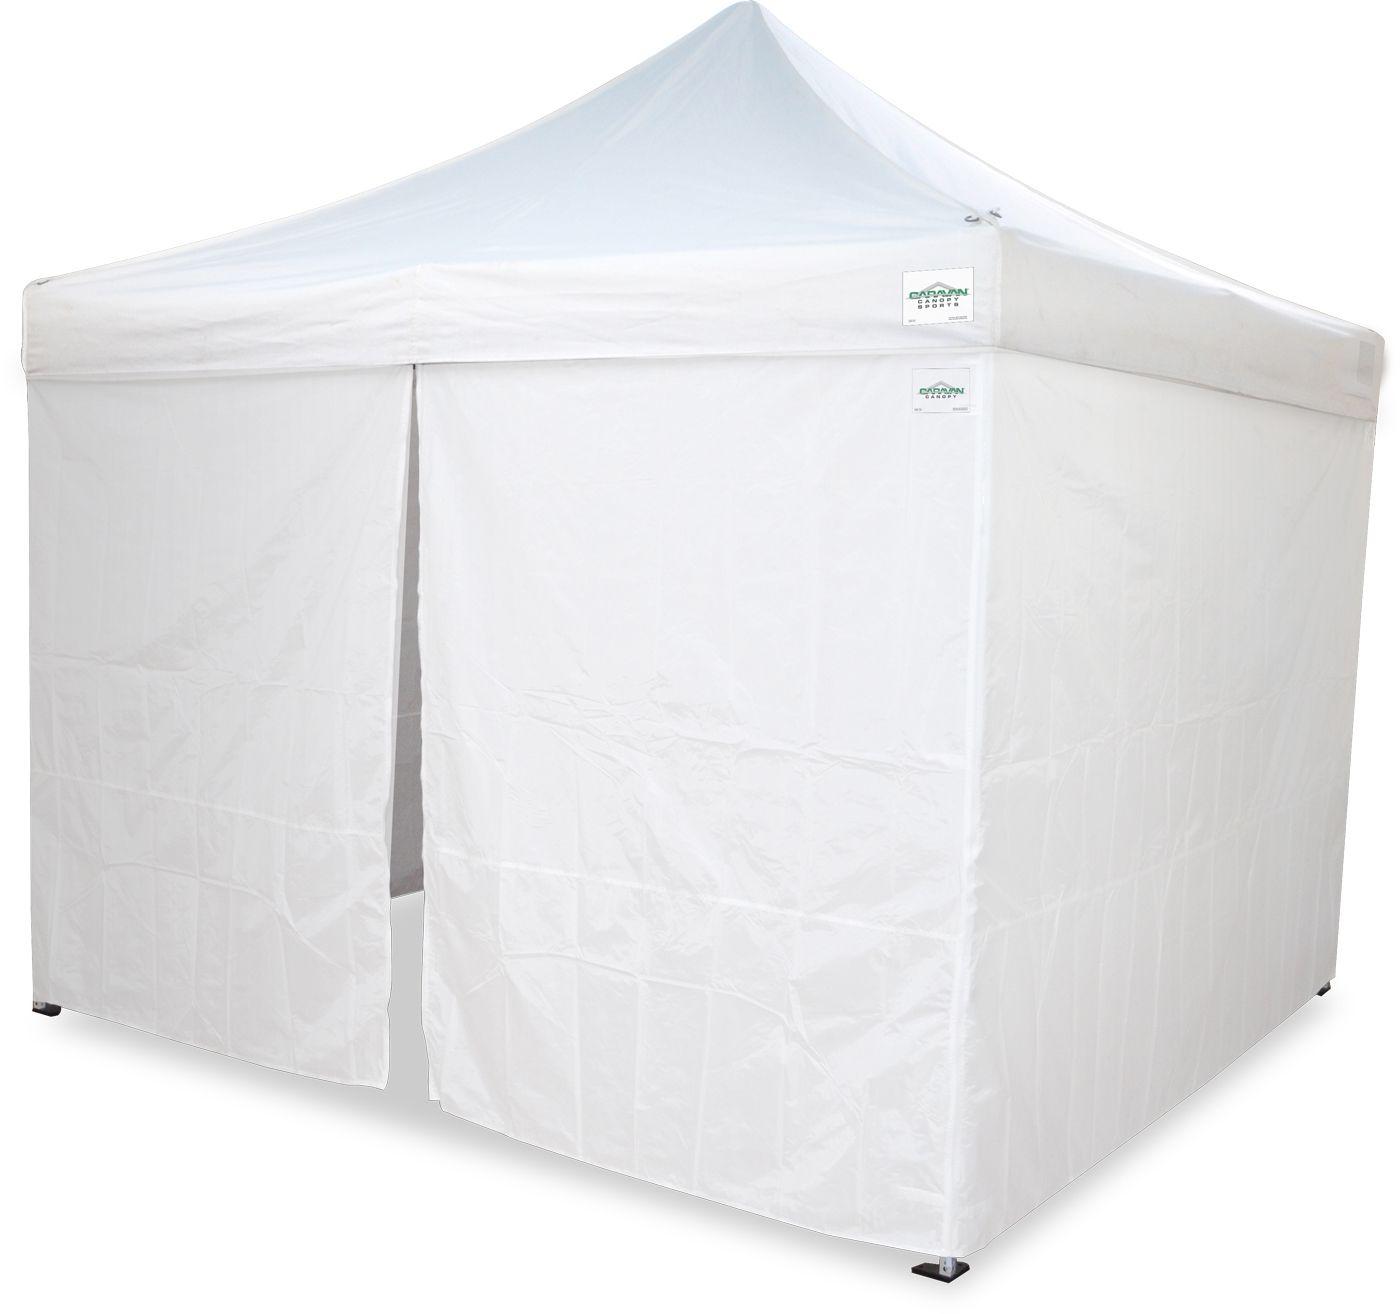 Caravan Canopy 10u0027 x 10u0027 Commercial Grade Canopy Sidewalls  sc 1 st  DICKu0027S Sporting Goods & Caravan Canopy 10u0027 x 10u0027 Commercial Grade Canopy Sidewalls ...